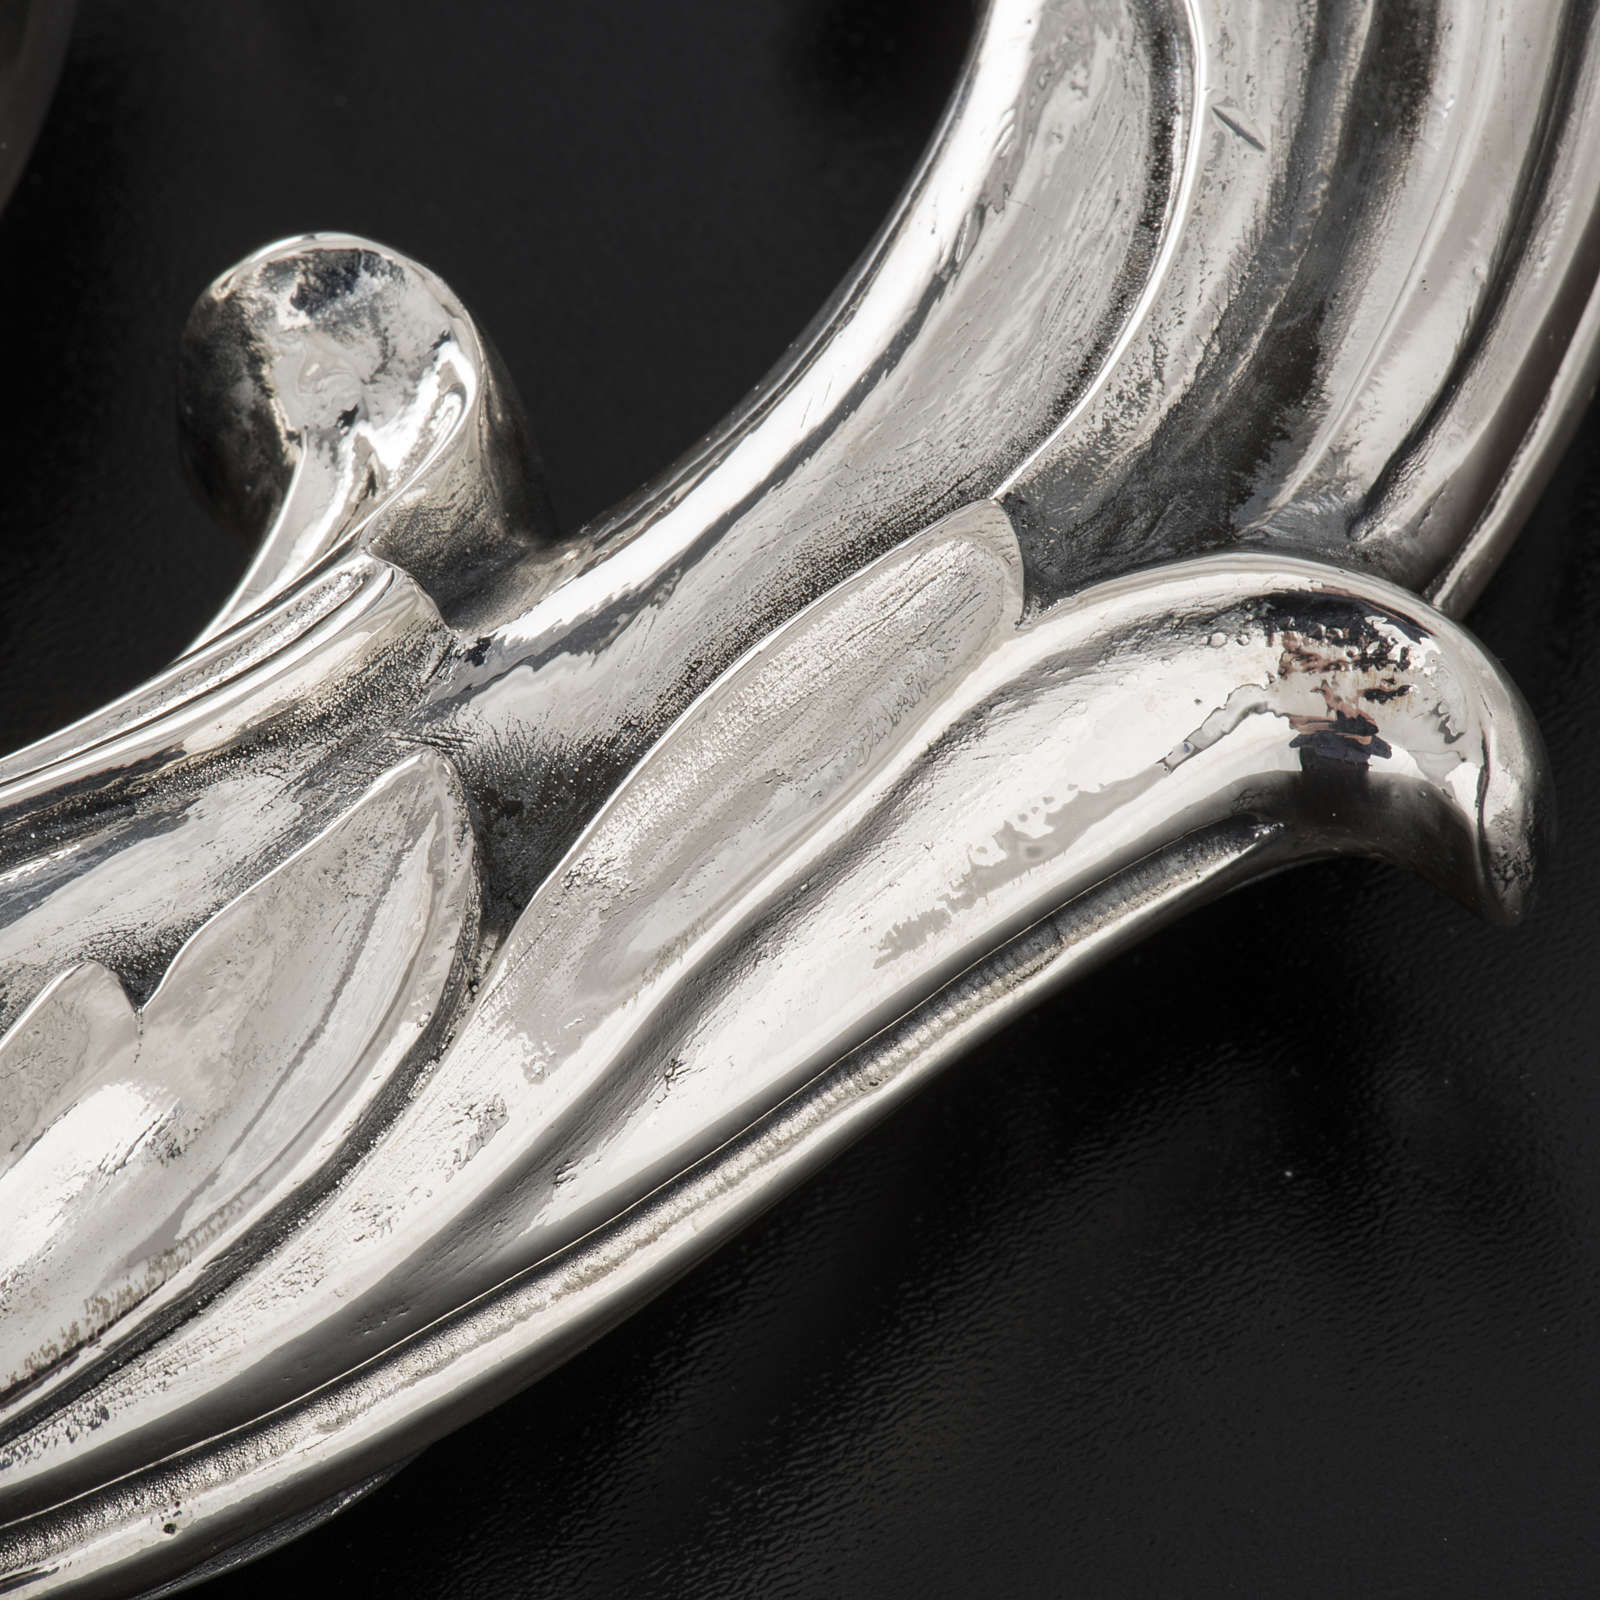 Crozier in 966 silver, electroforming, leaves model 3